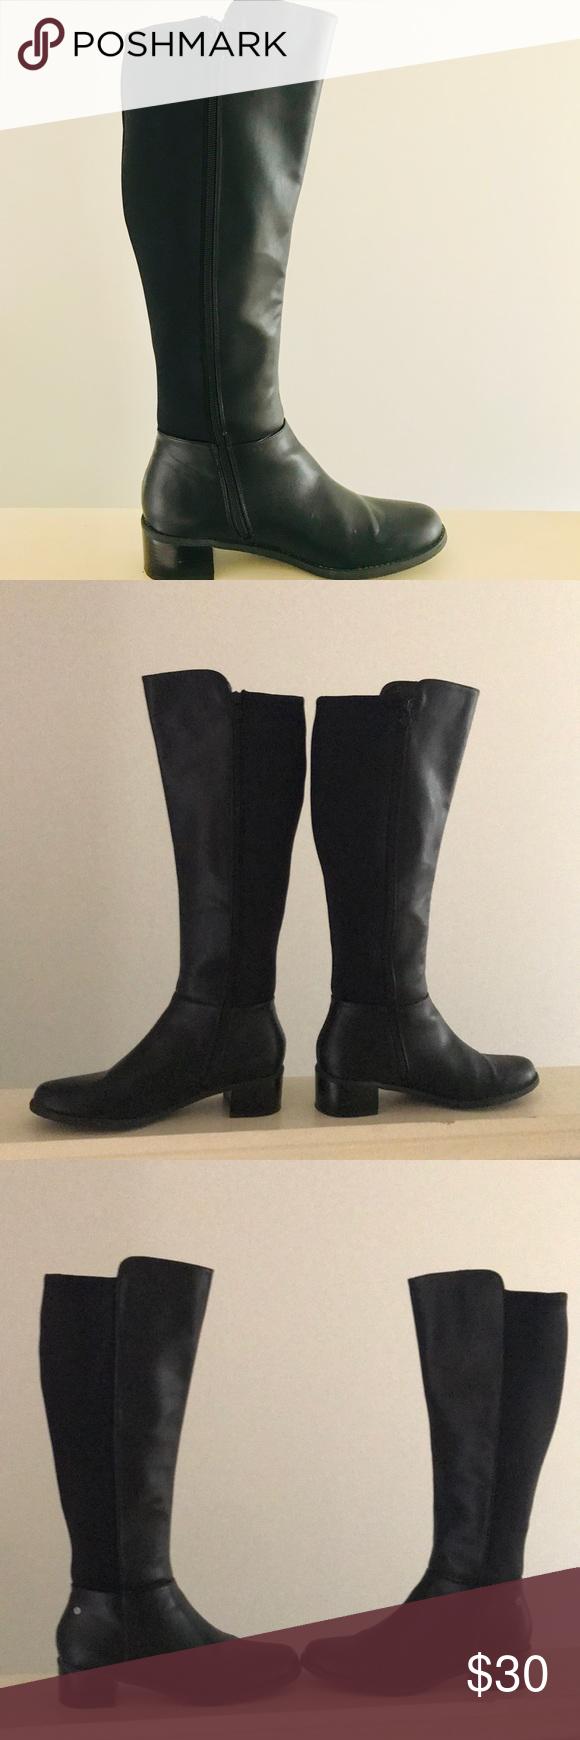 b10e8fe54d0a Dana Buchman Tall Black Zip Heeled Boots 9.5 M EUC Same or Next Day  Shipping Bundle